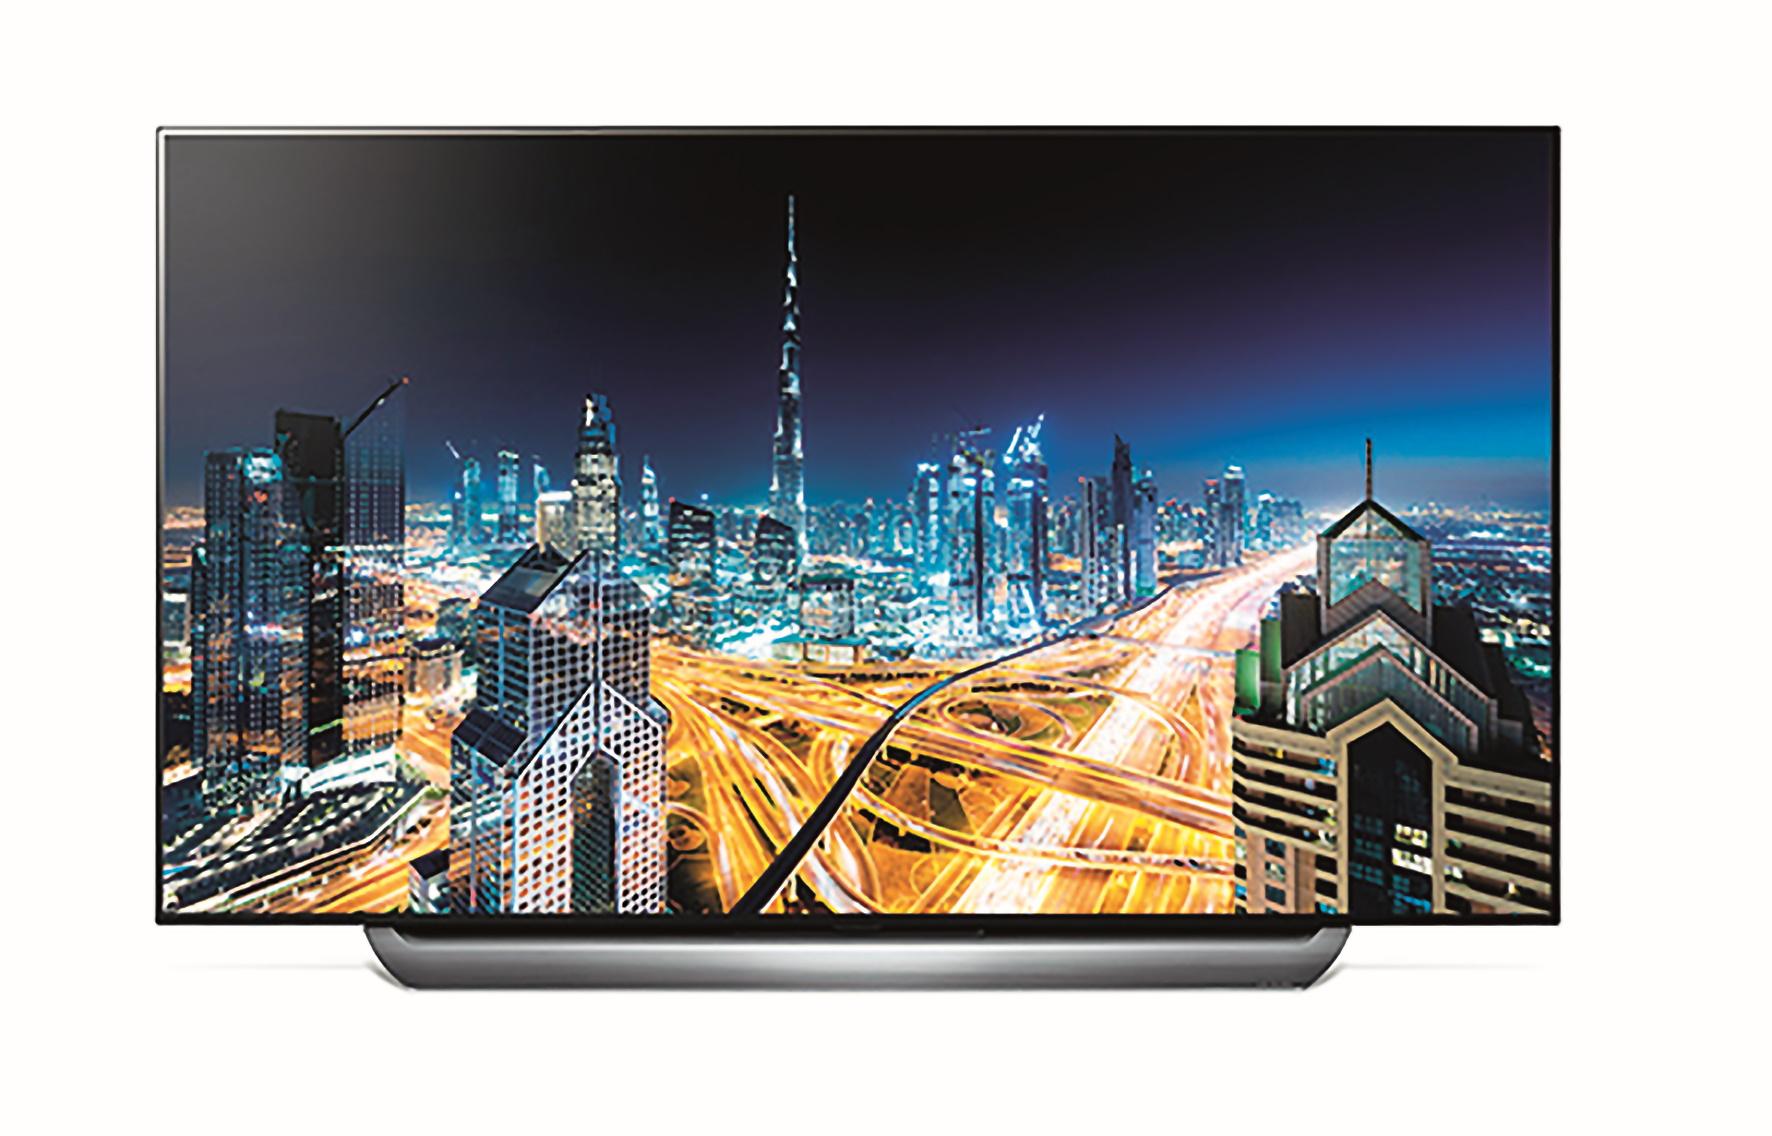 LG OLED C8-Serie